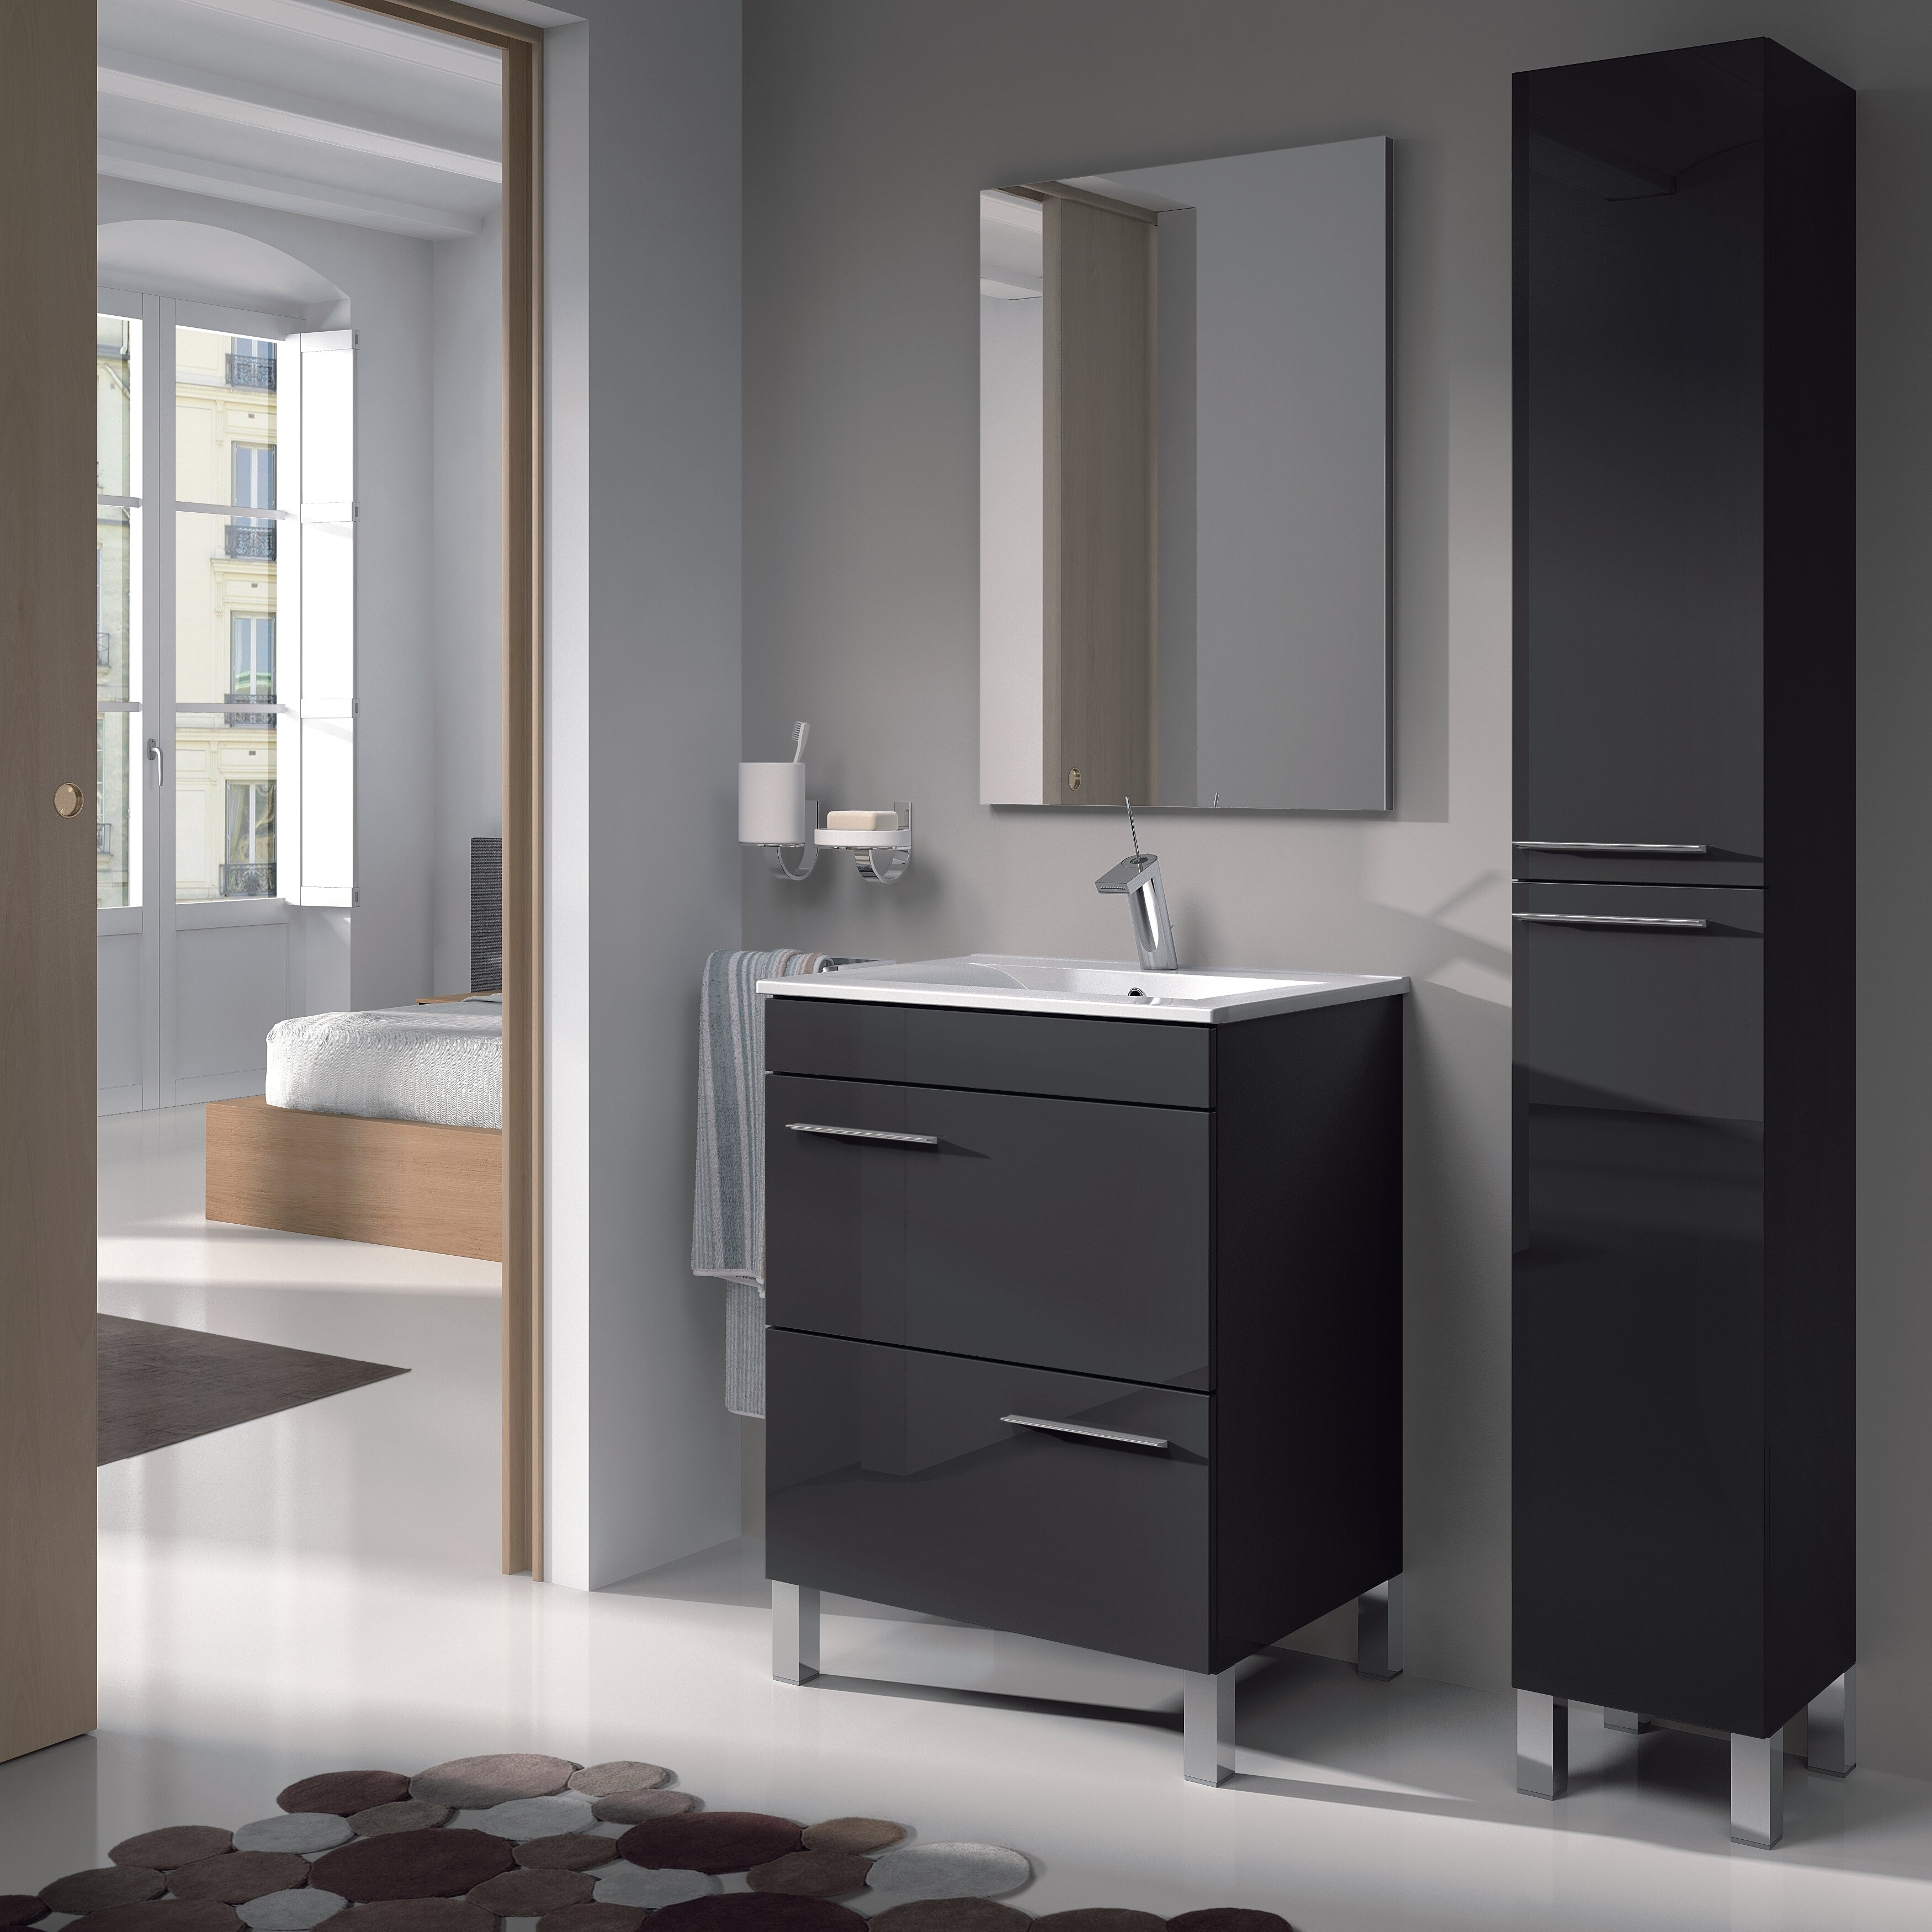 Home Etc Althea 30 X 182 Cm Free Standing Tall Bathroom